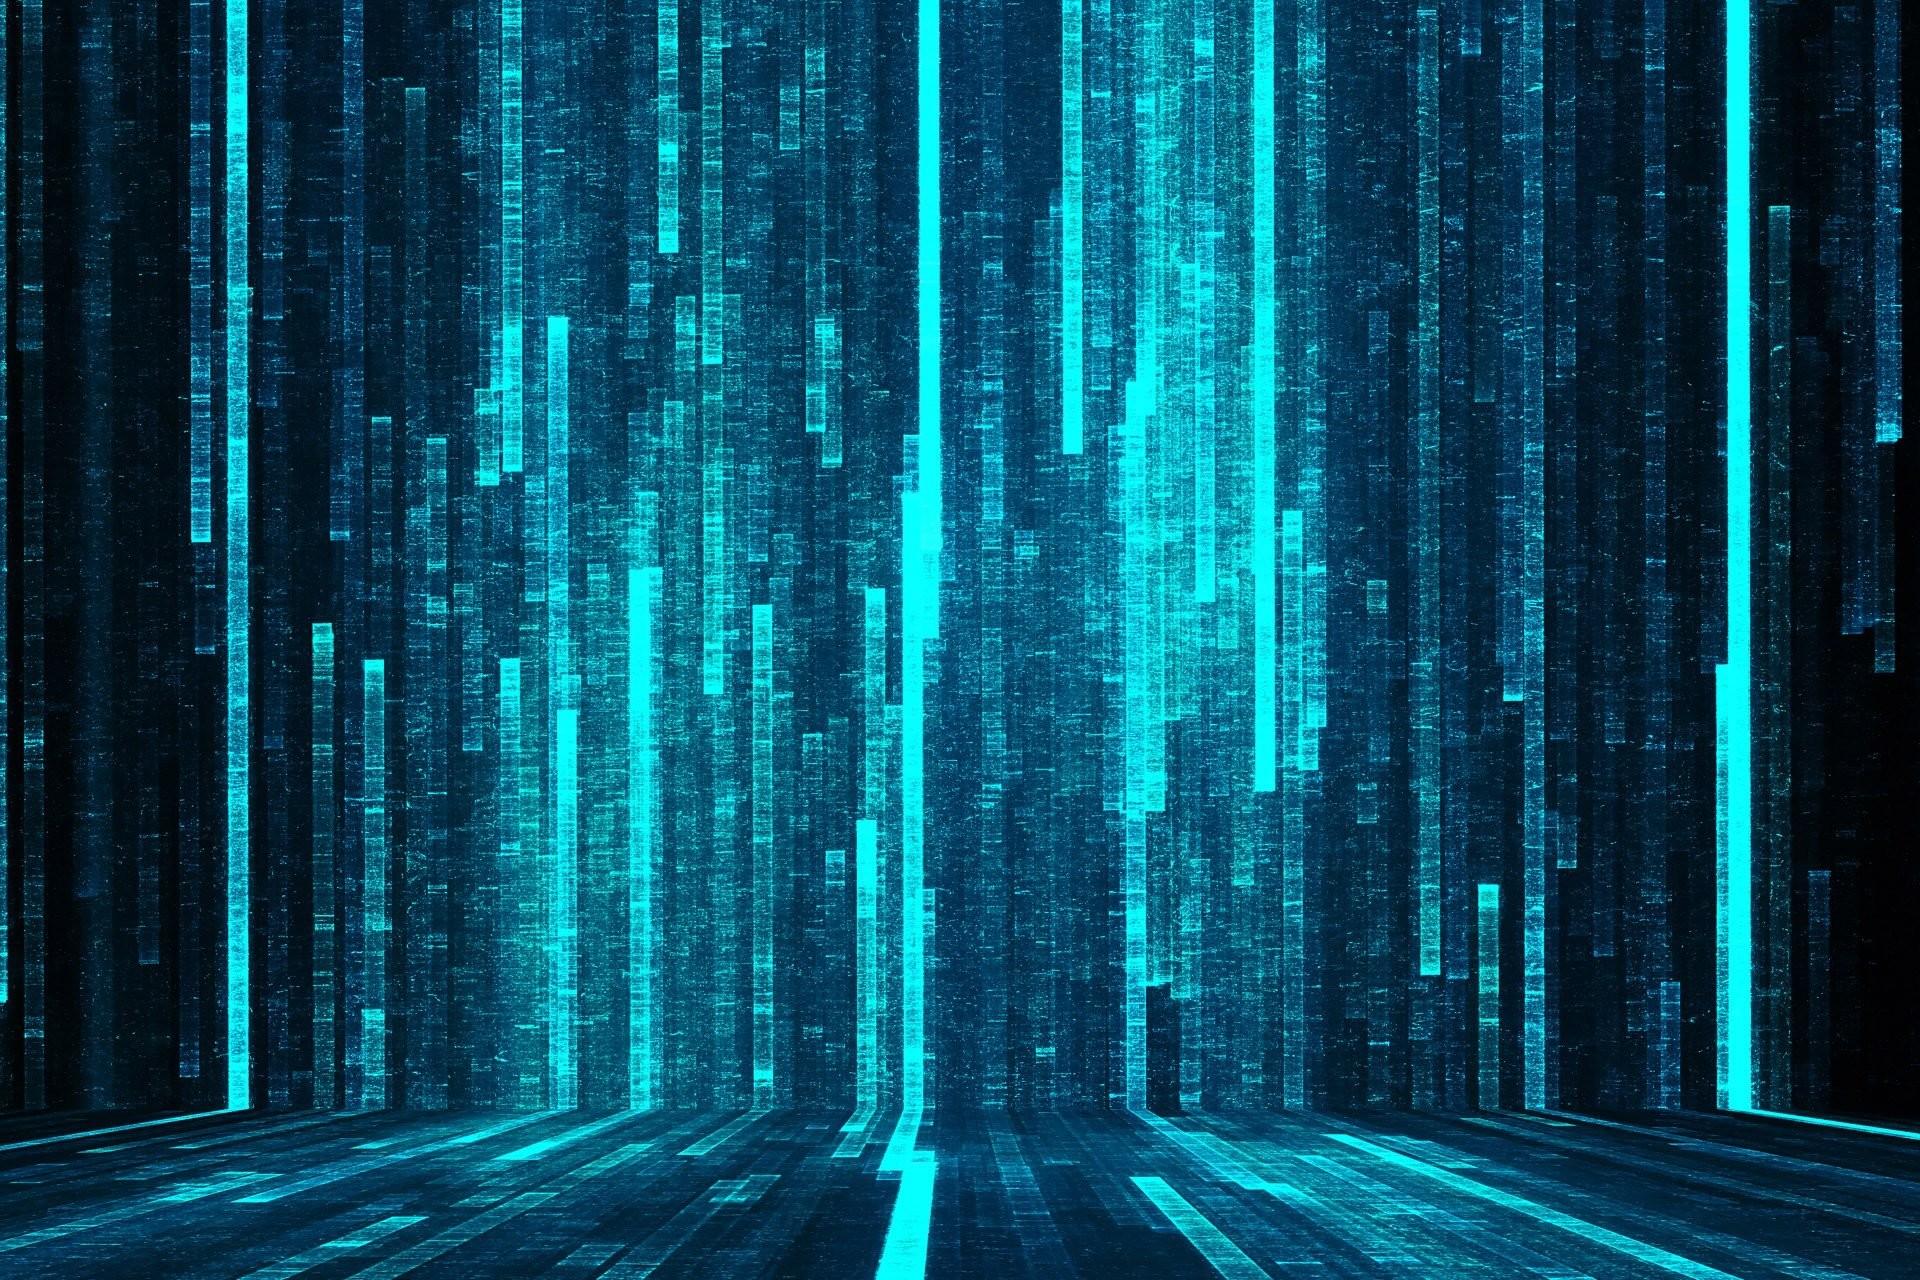 Matrix Falling Code Live Wallpaper Binary Code Wallpaper 183 ① Wallpapertag